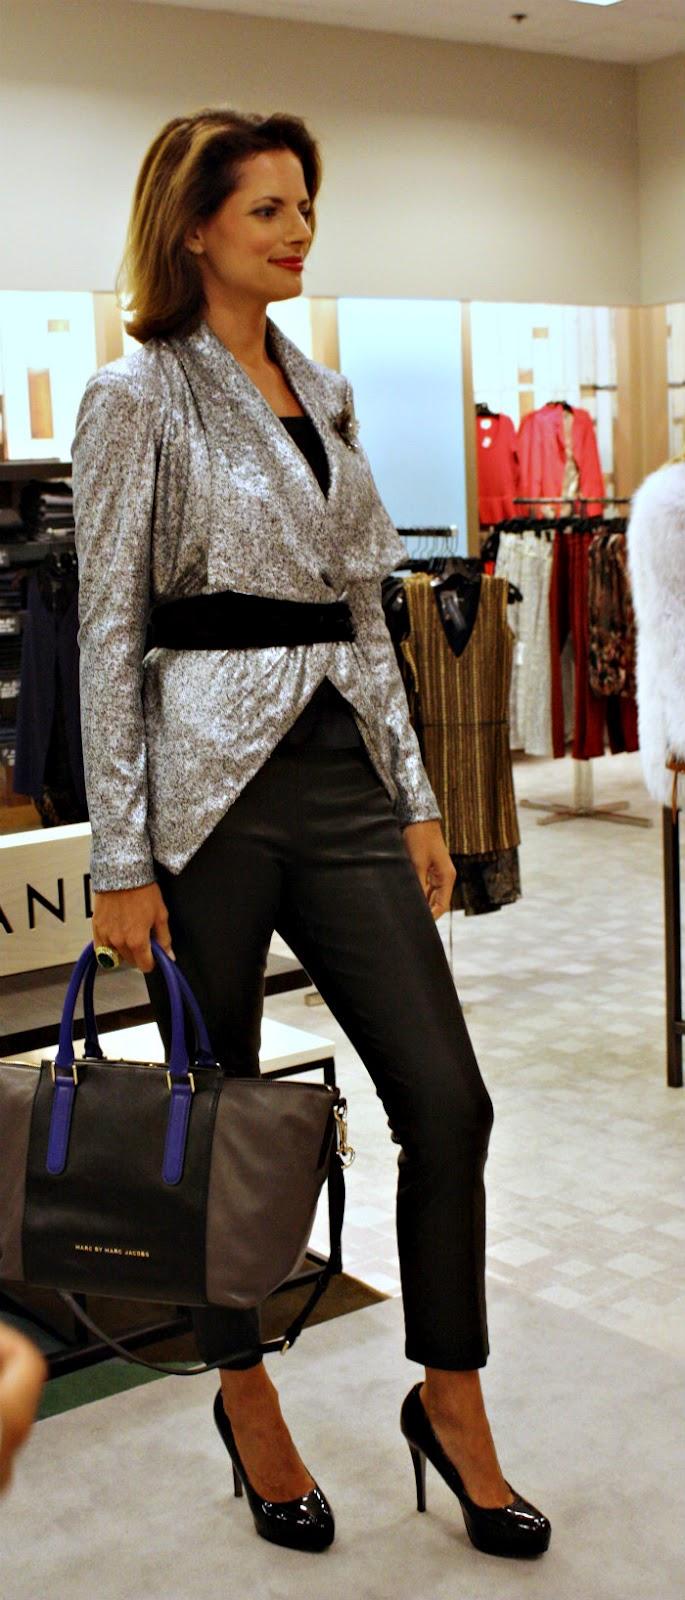 nm17 - DC Fashion Event: CapFABB visits Neiman Marcus